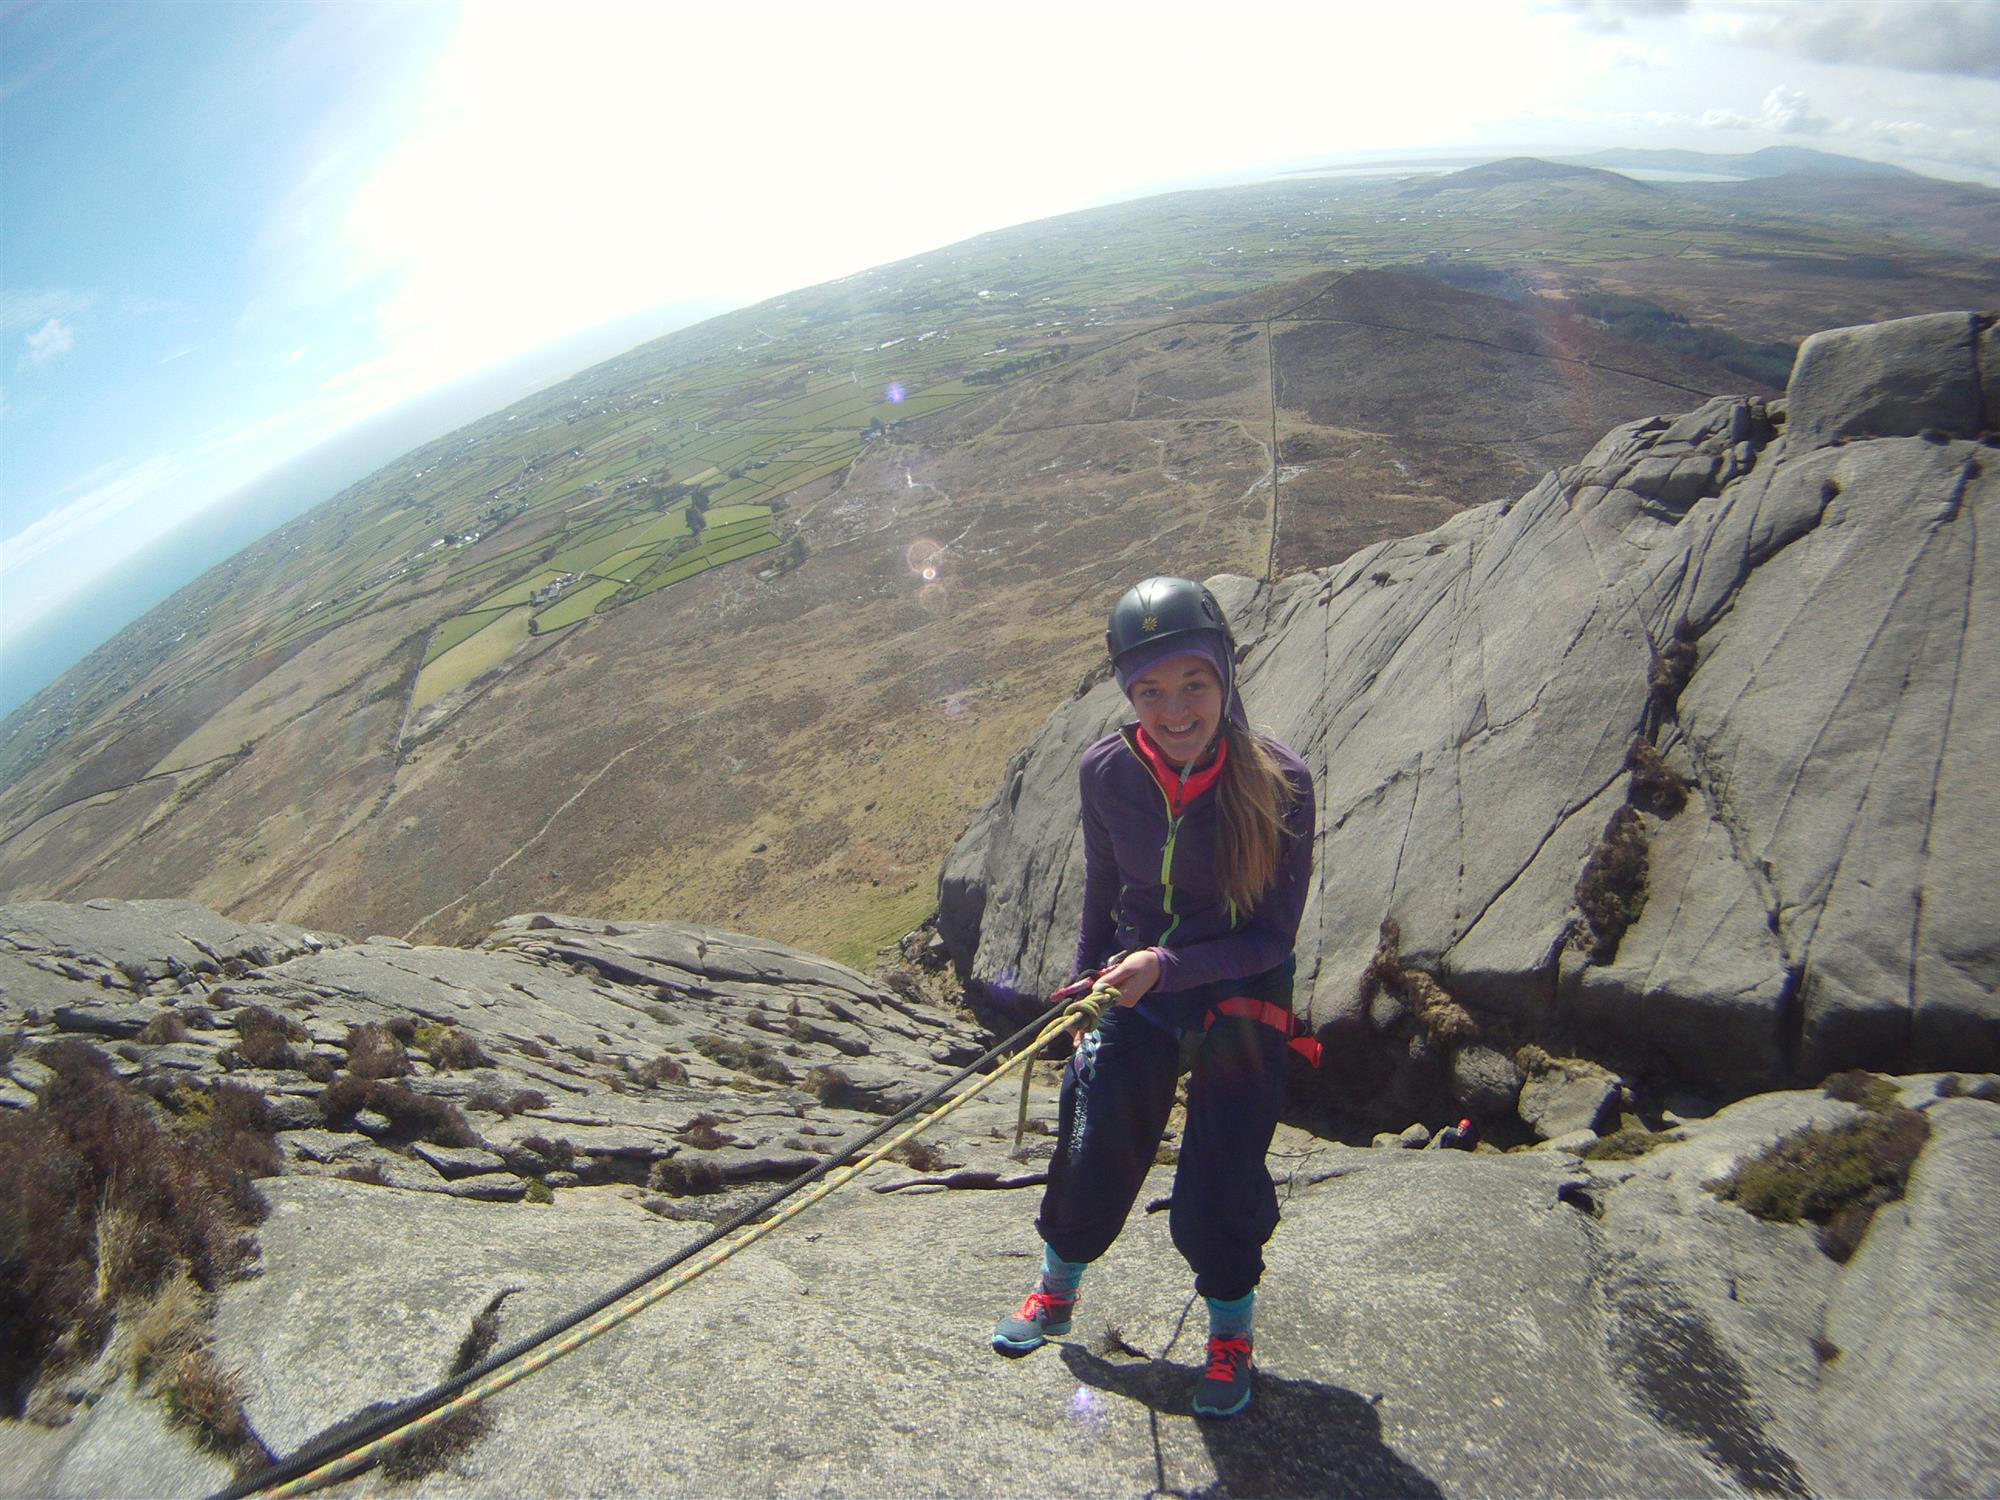 Kids-rock-climbing